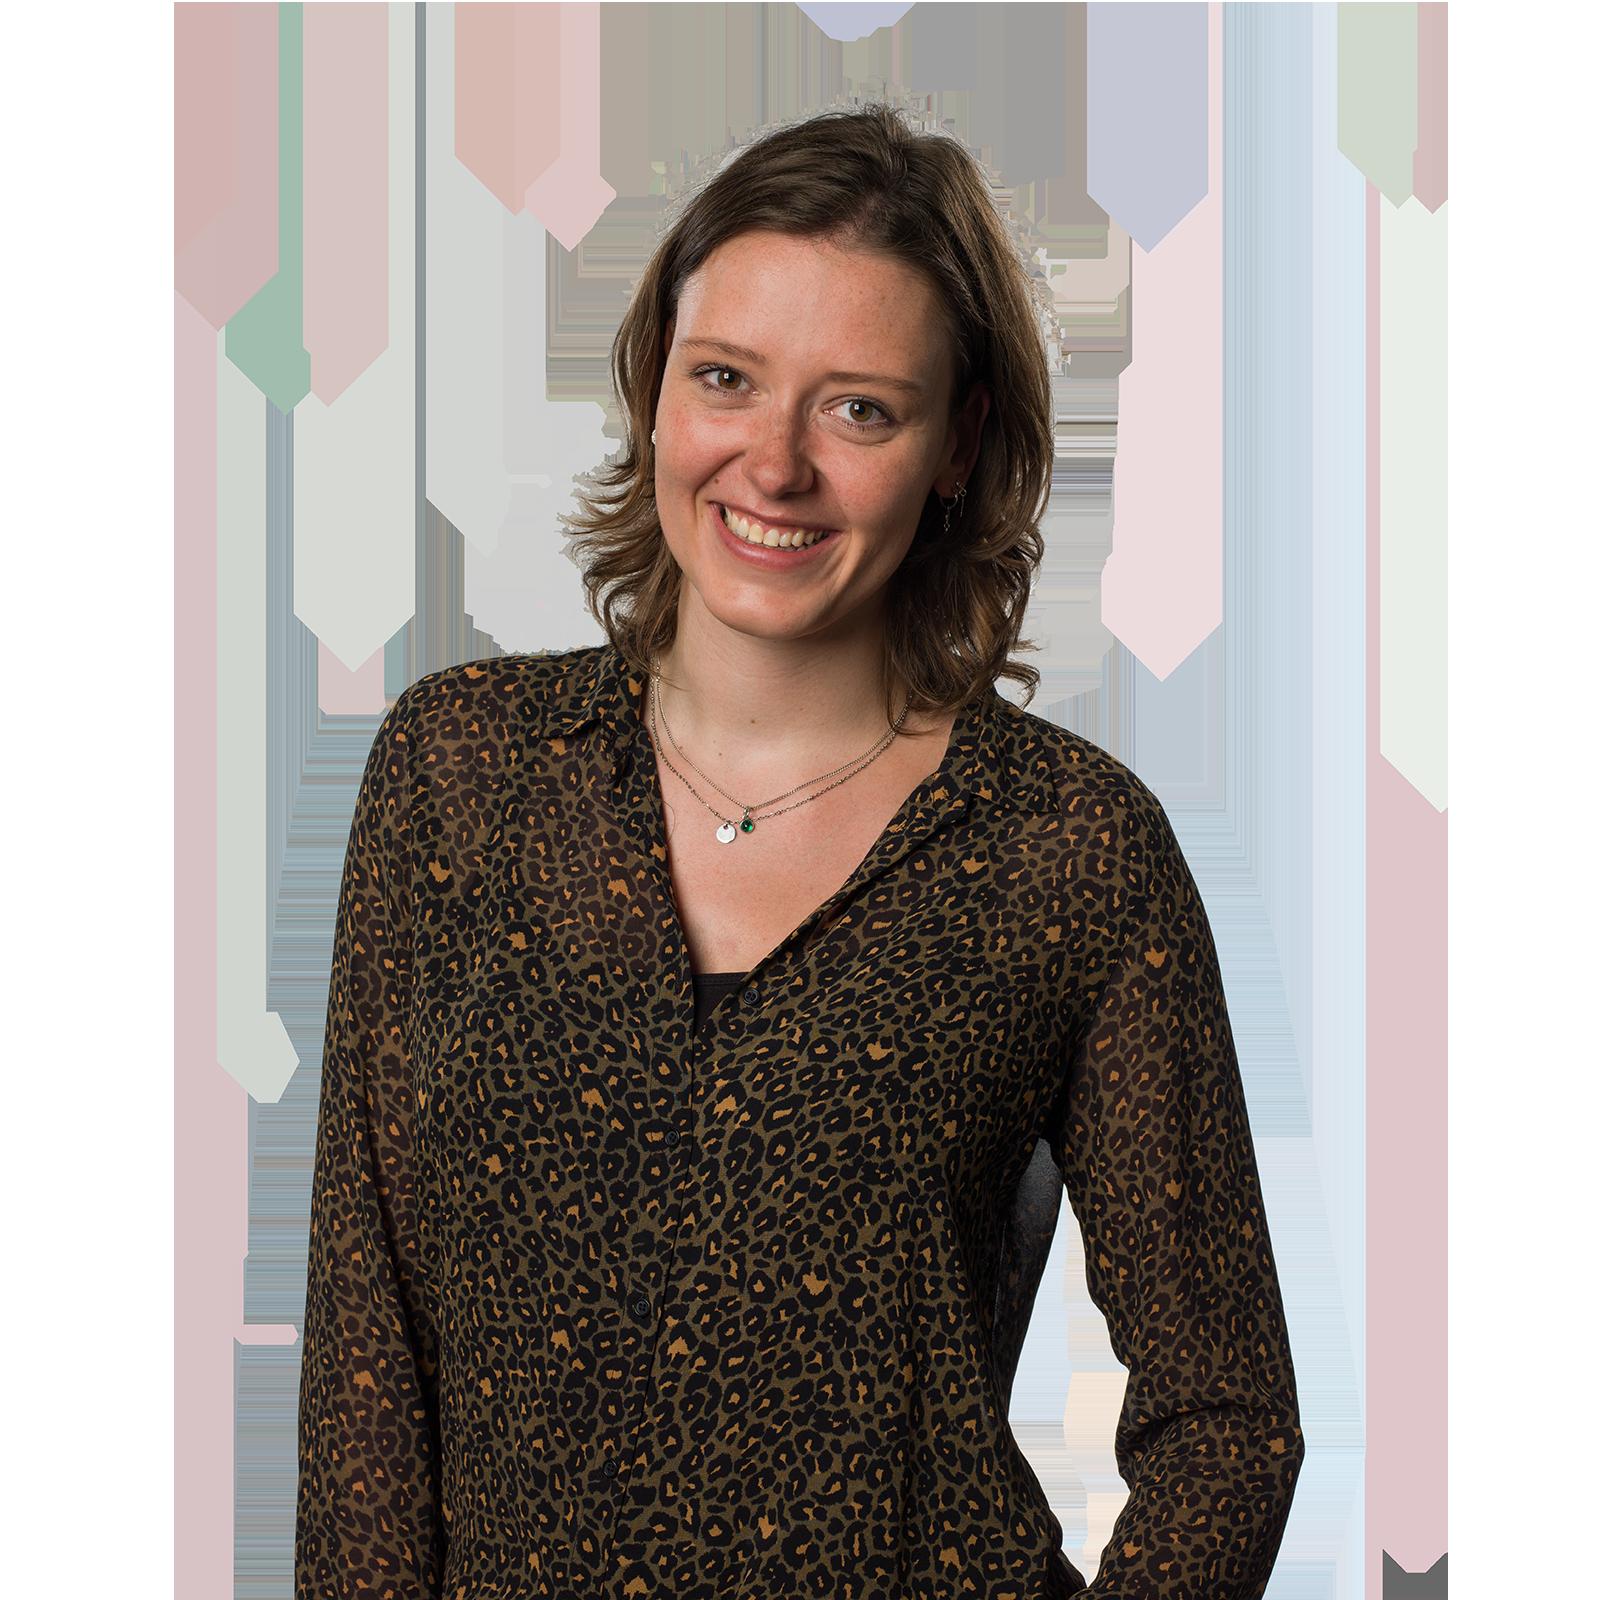 Lisa van der Ploeg